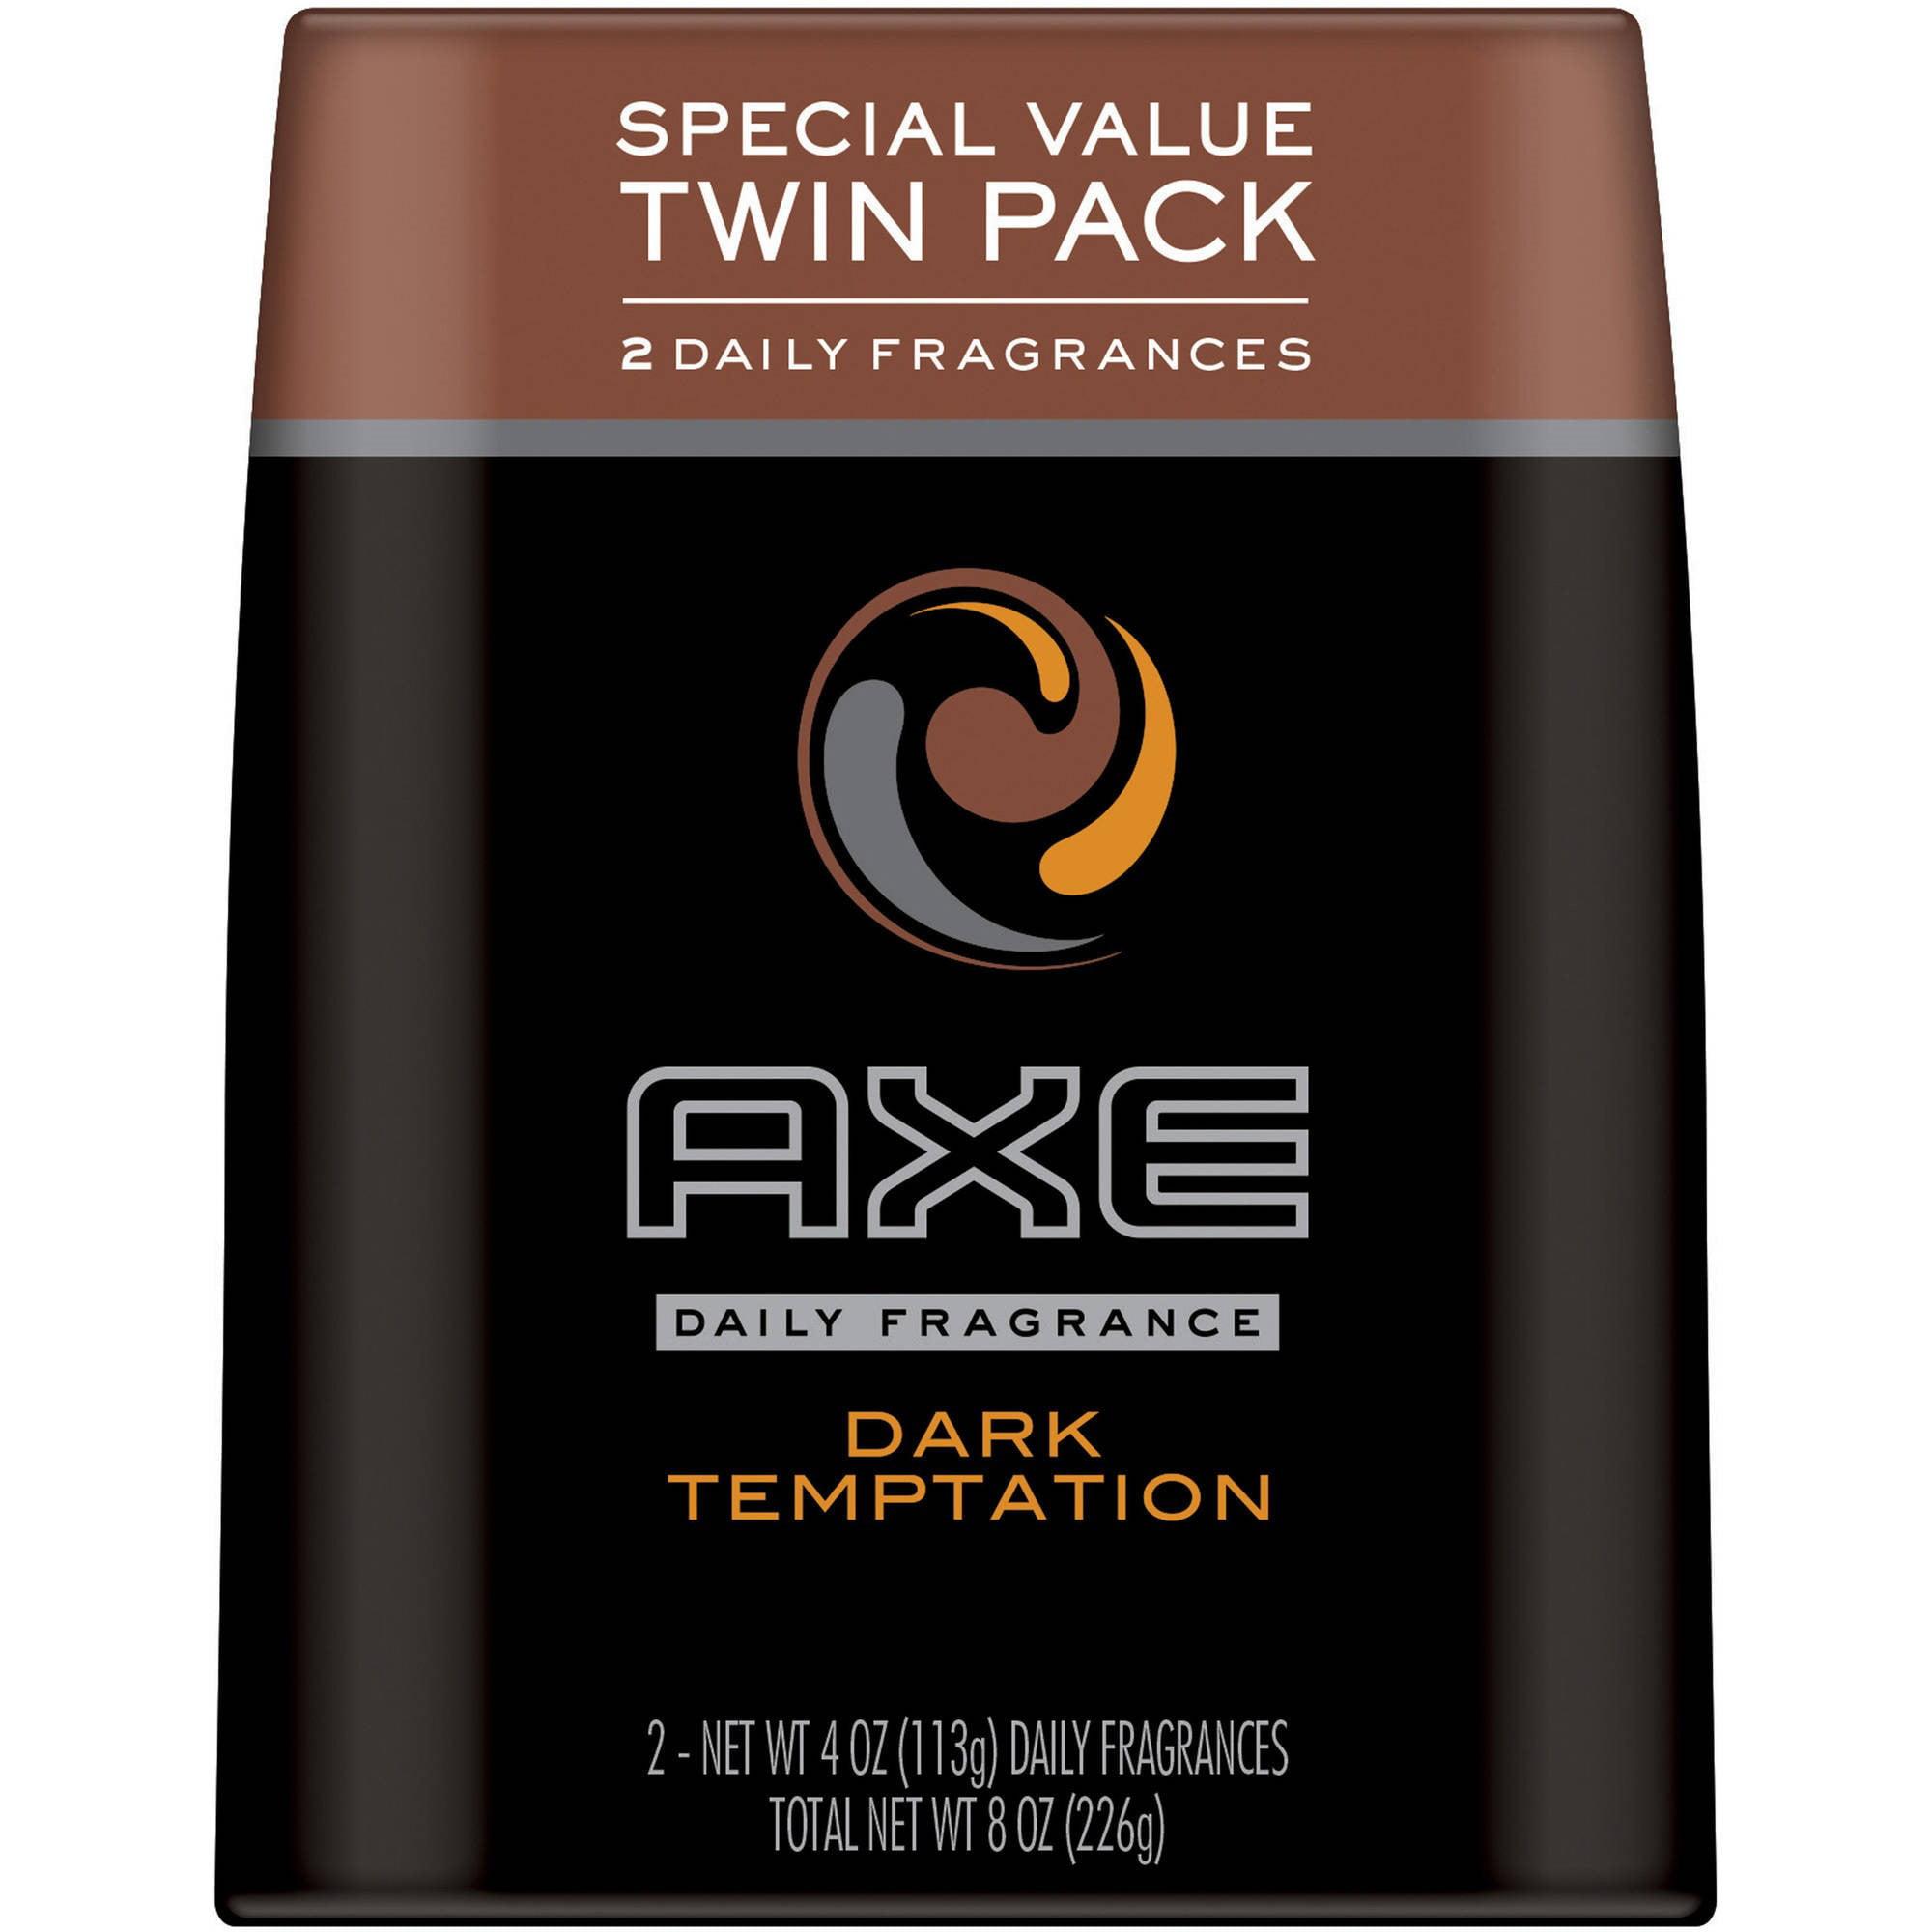 AXE Deodorant Bodyspray 2 Pack Dark Temptation,Twin Pack